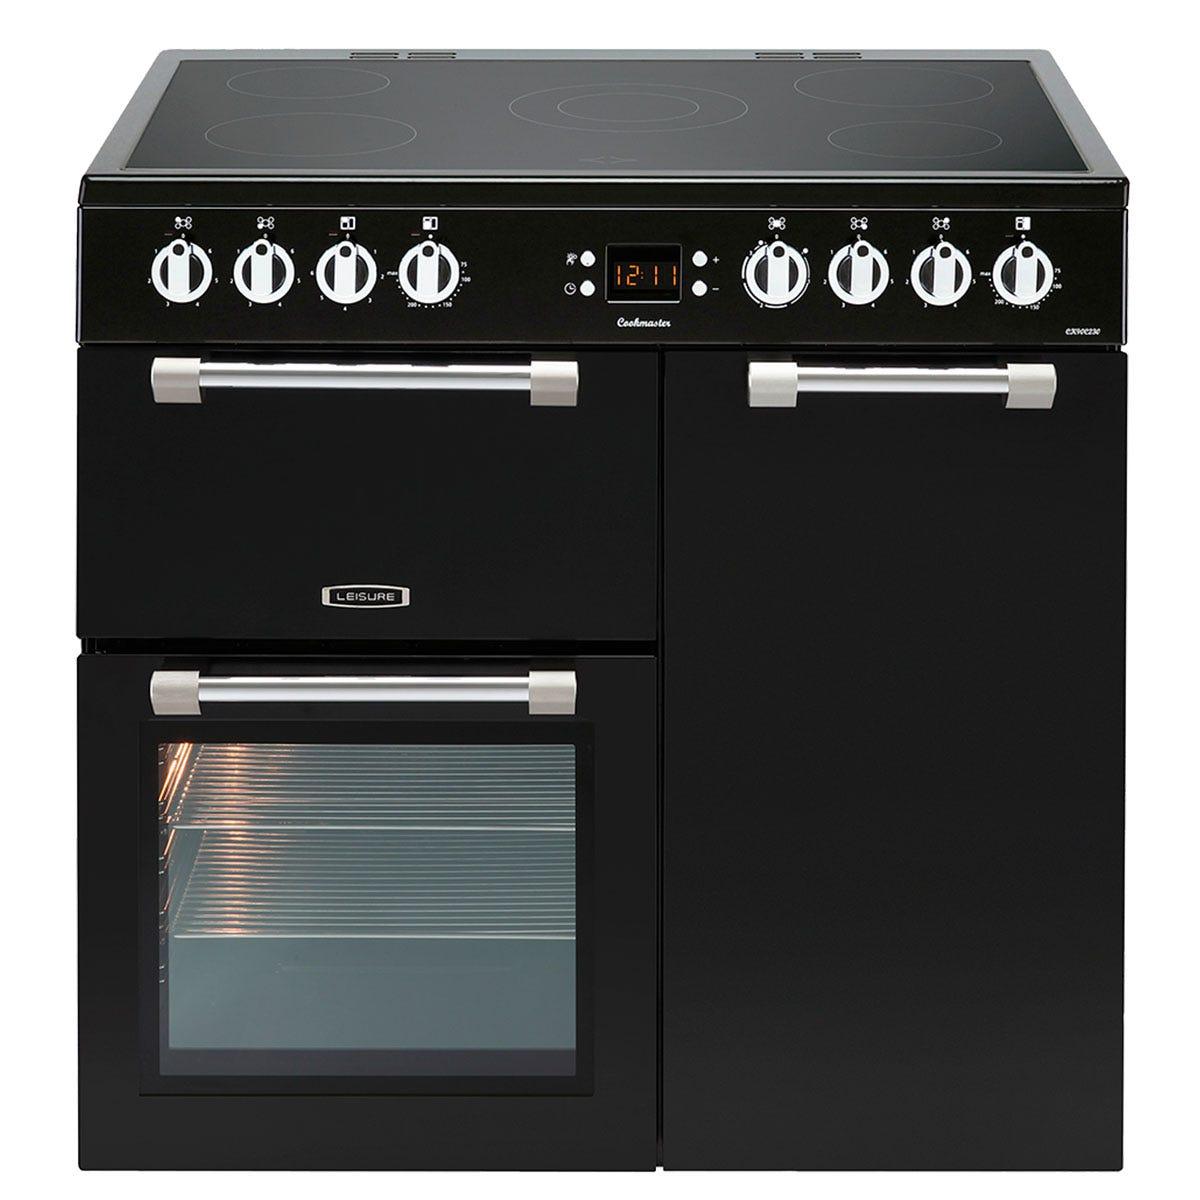 Leisure CK90C230K 90cm Cookmaster Electric Range Cooker - Black